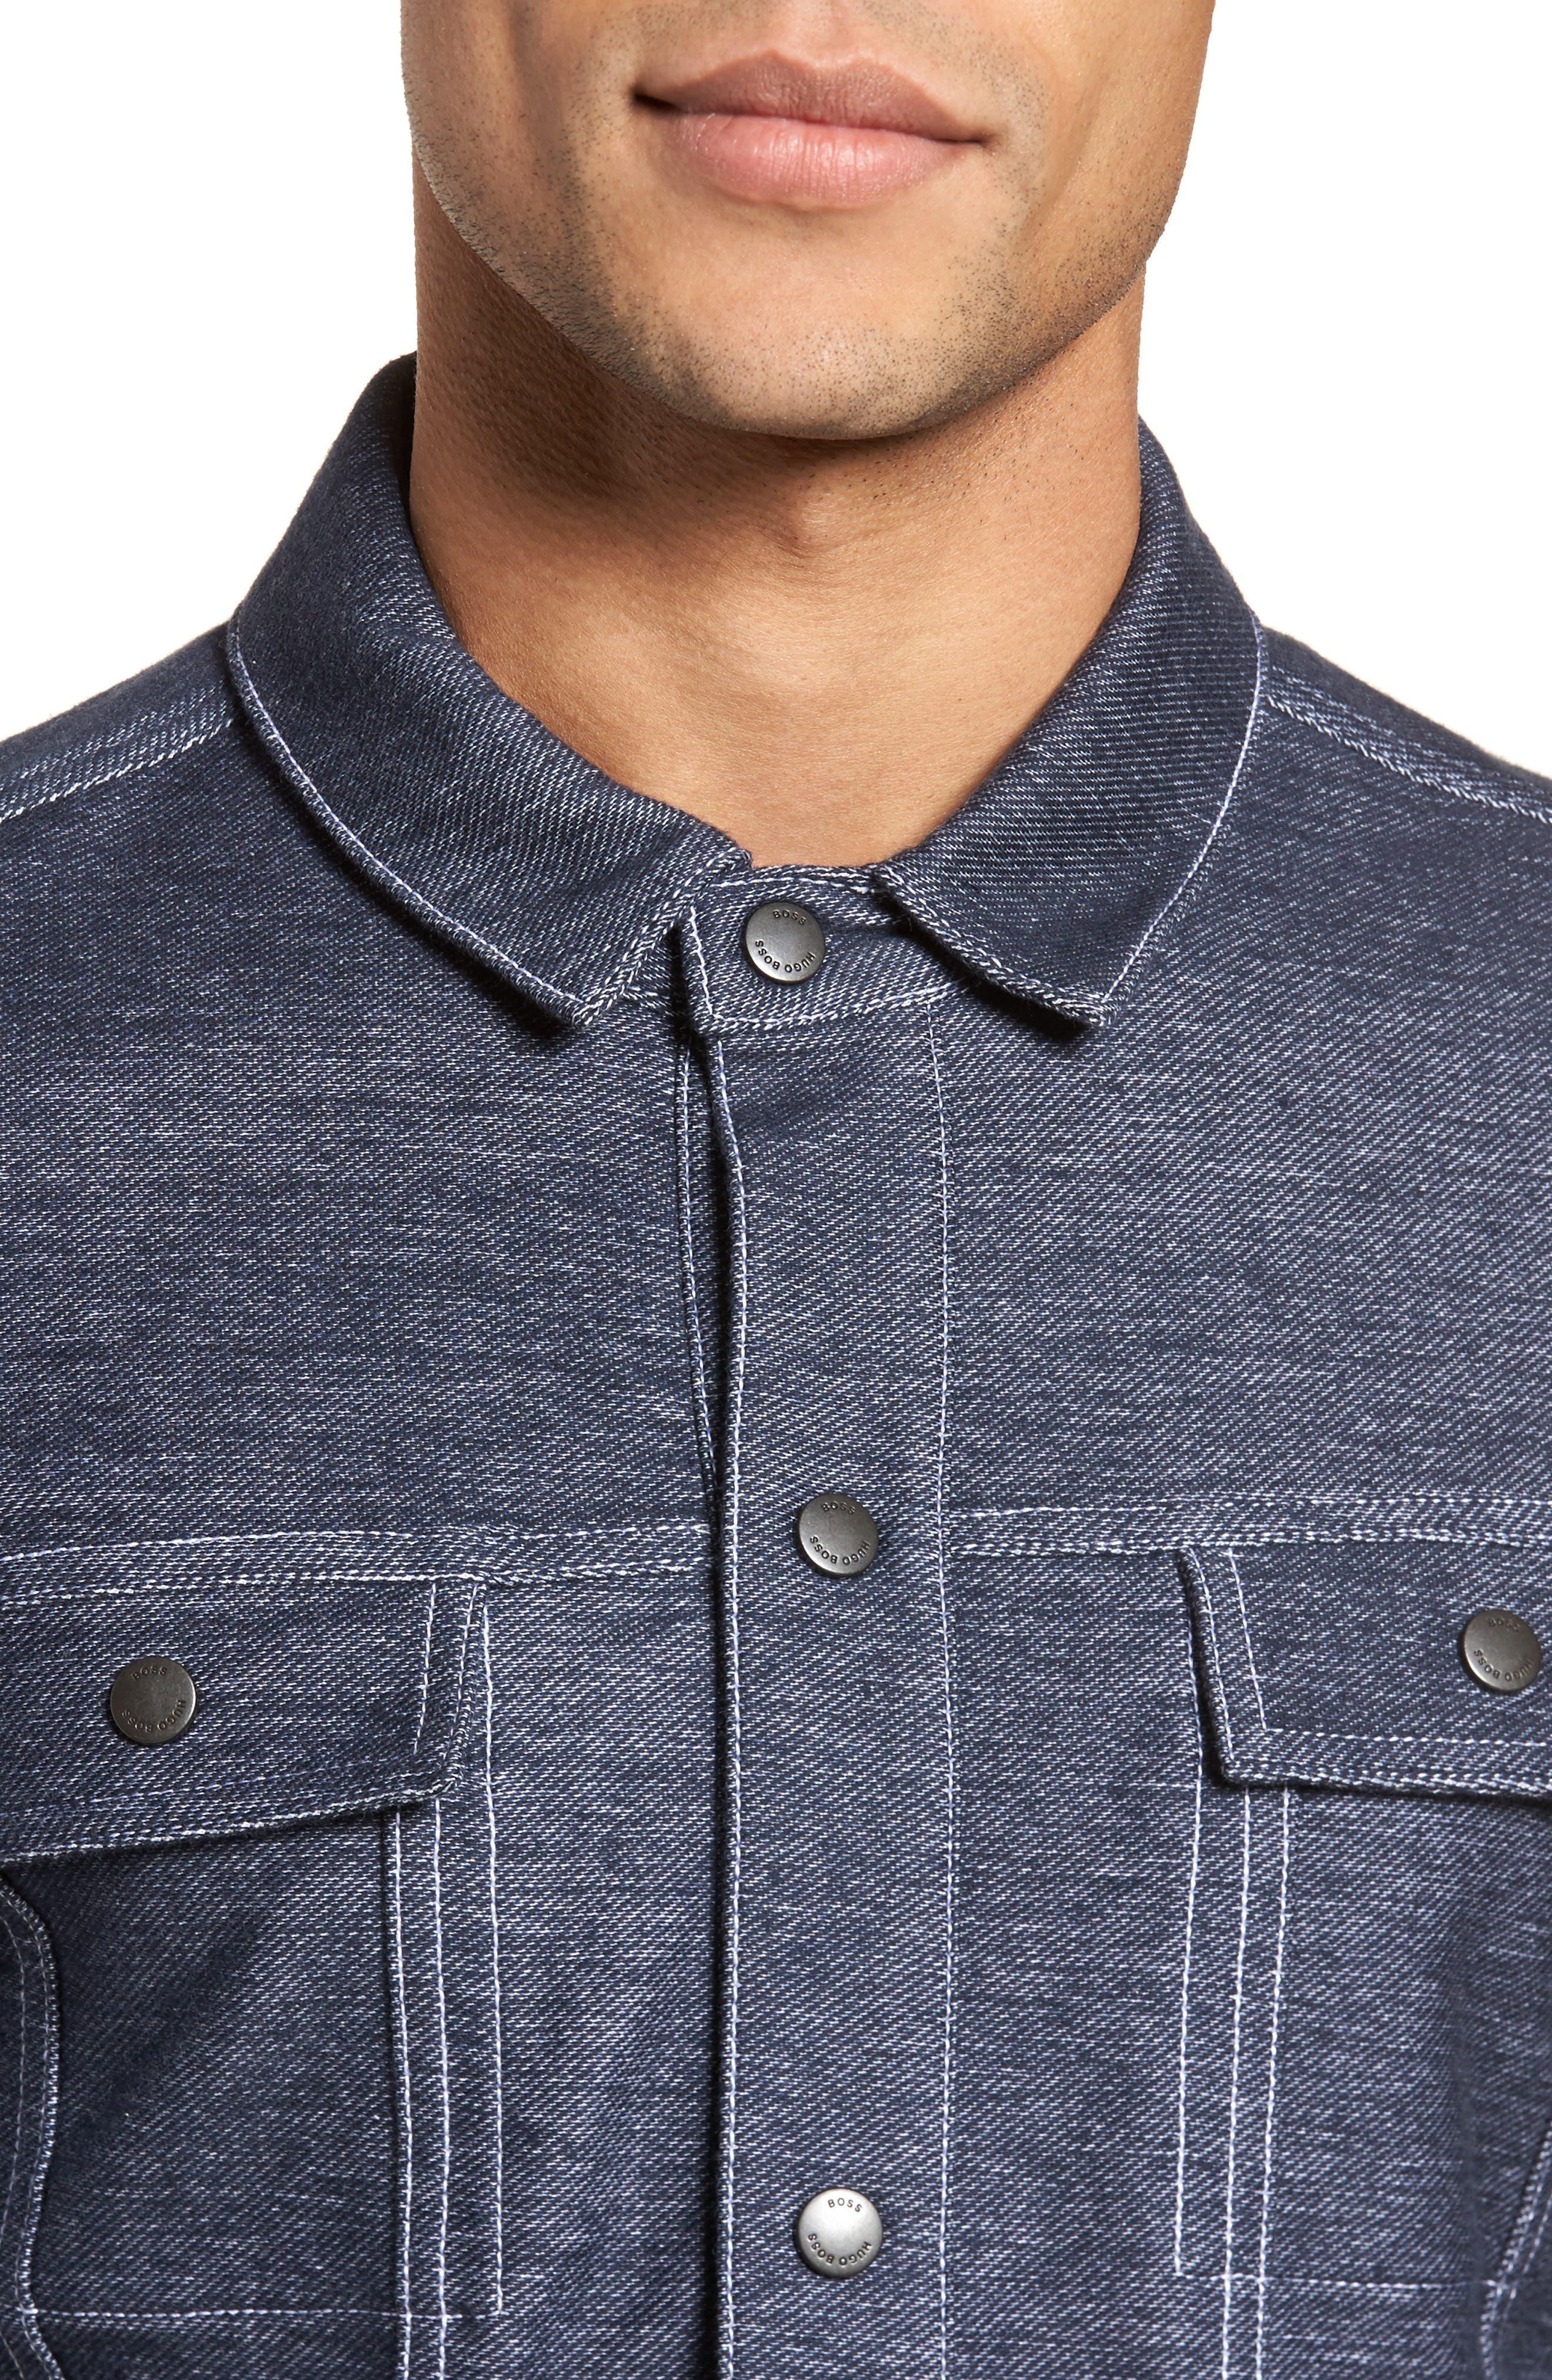 Sigmon Stretch Denim Jacket,                             Alternate thumbnail 4, color,                             410